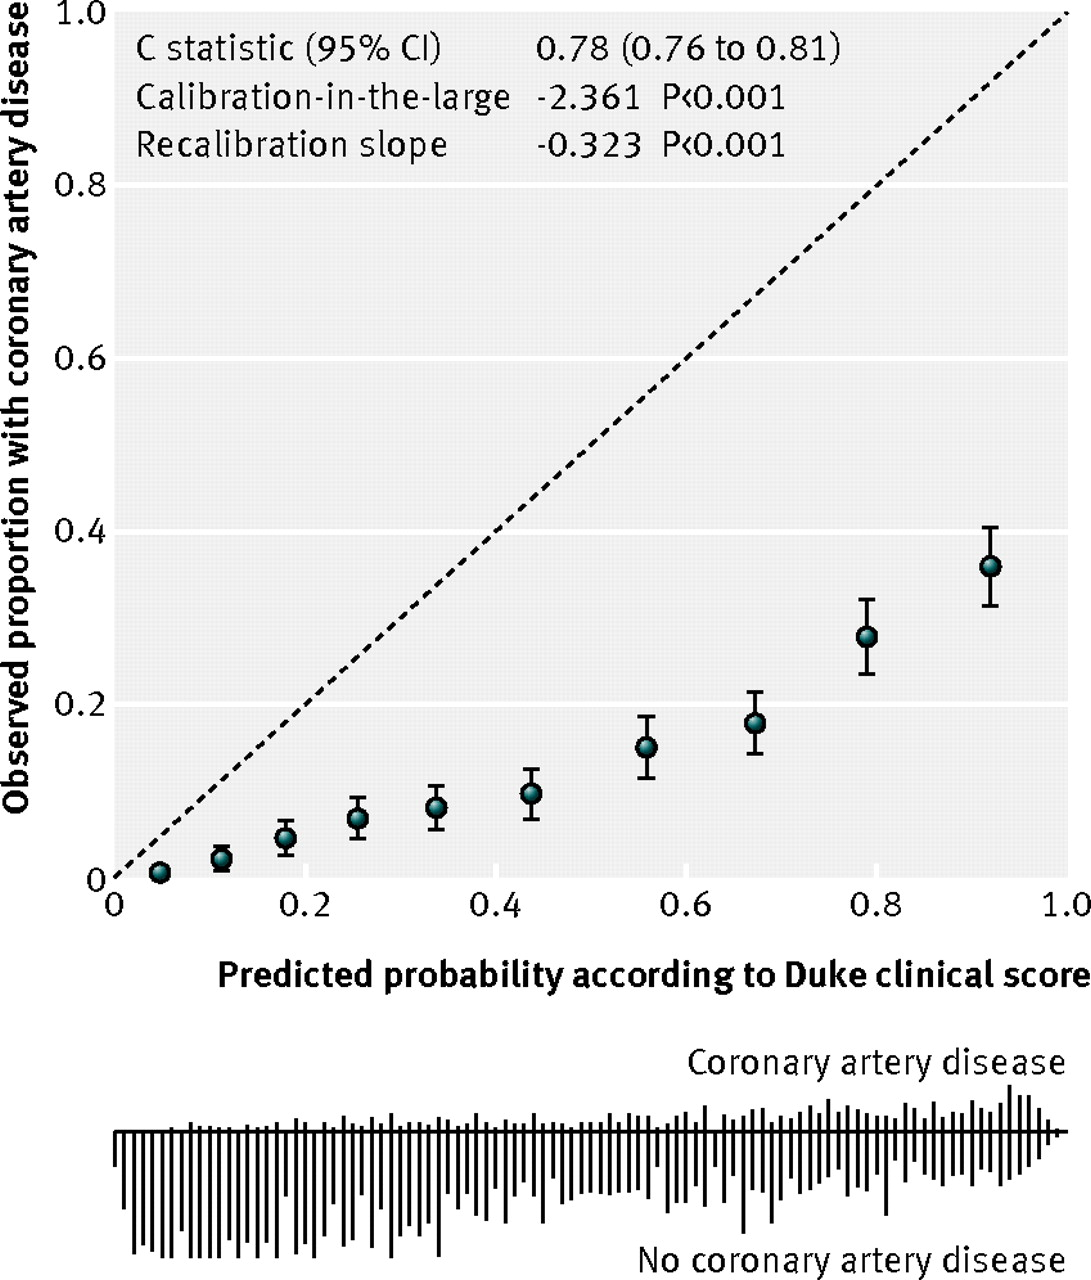 Prediction model to estimate presence of coronary artery disease